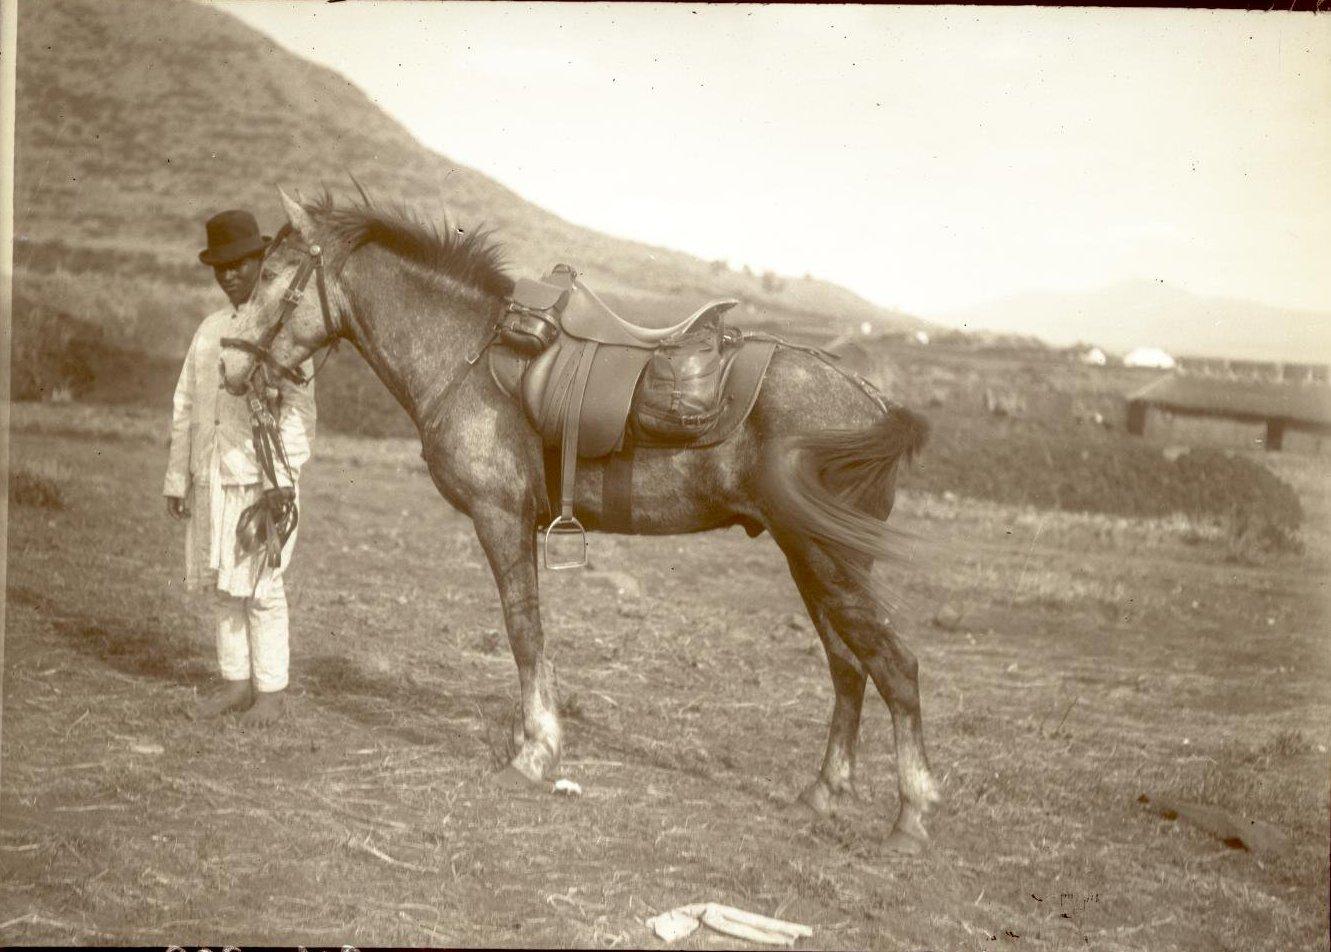 316. 1899. Абиссиния. г. Аддис-Абеба. Лошадь врача Драгомирова